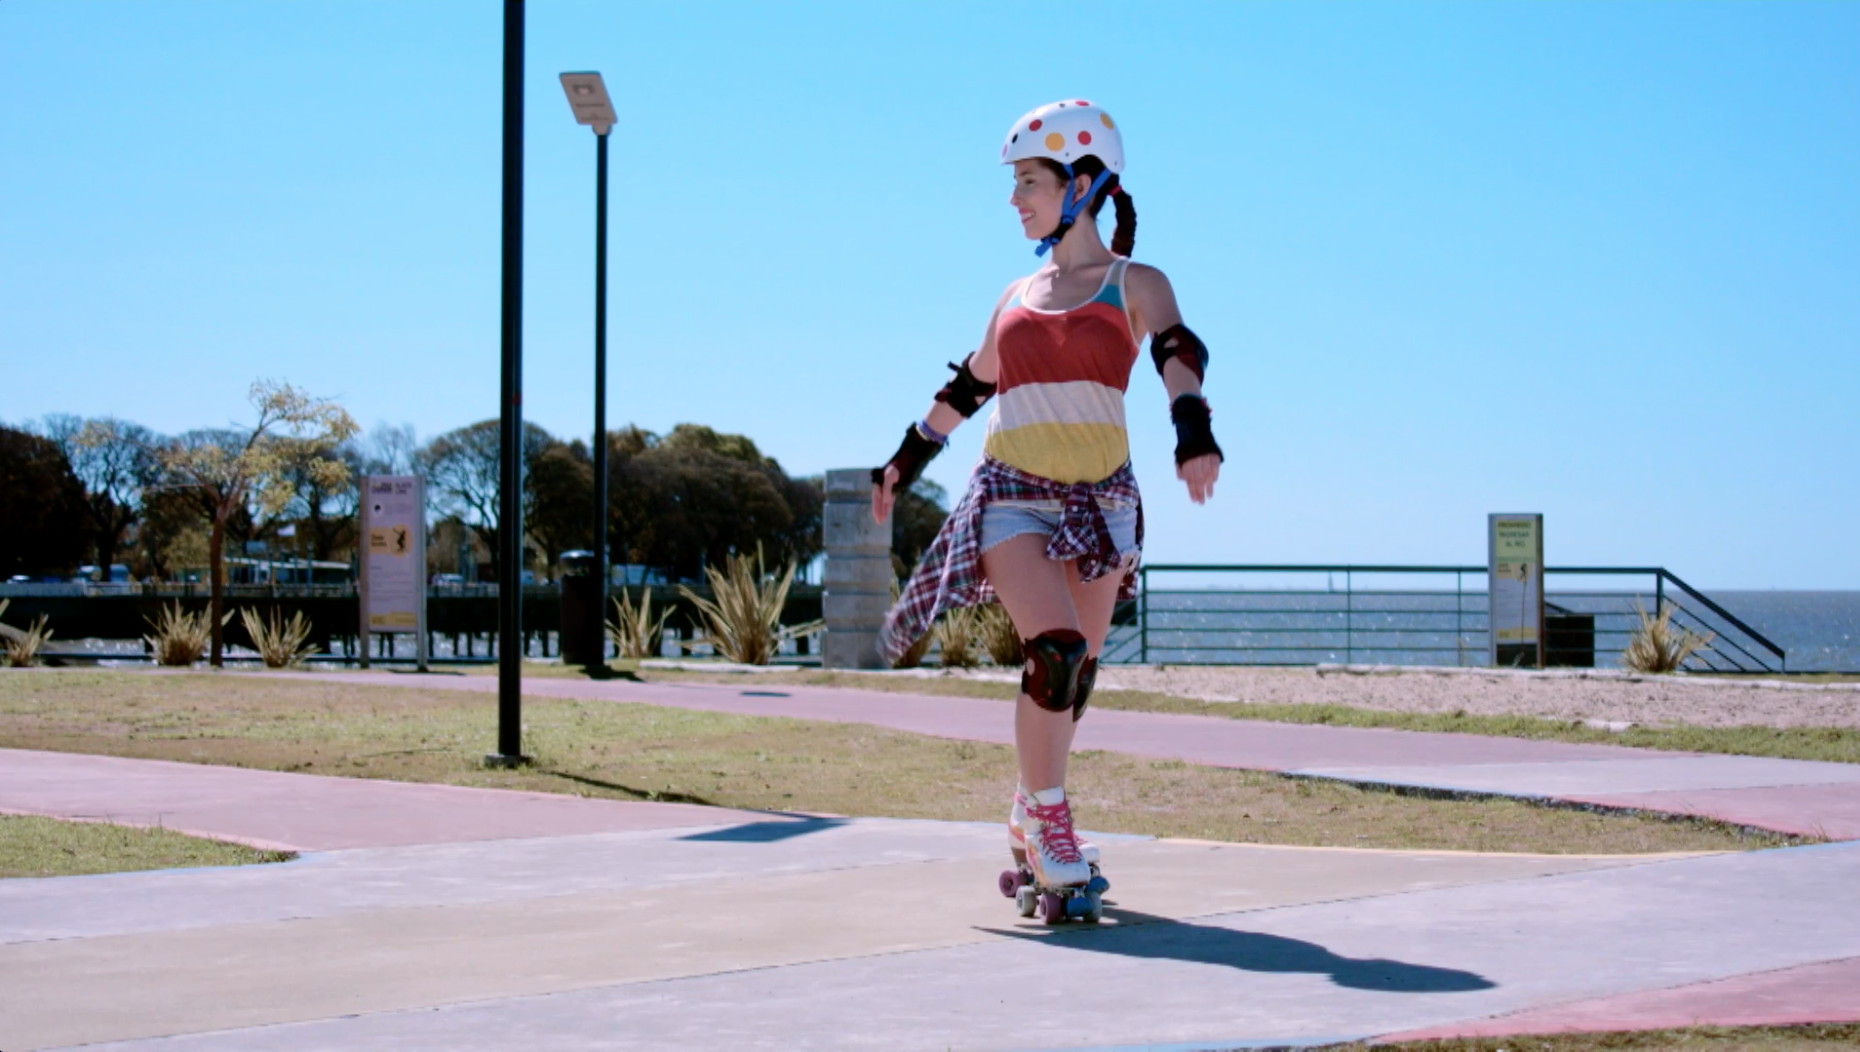 Curvas - Hora de patinar - Sou Luna